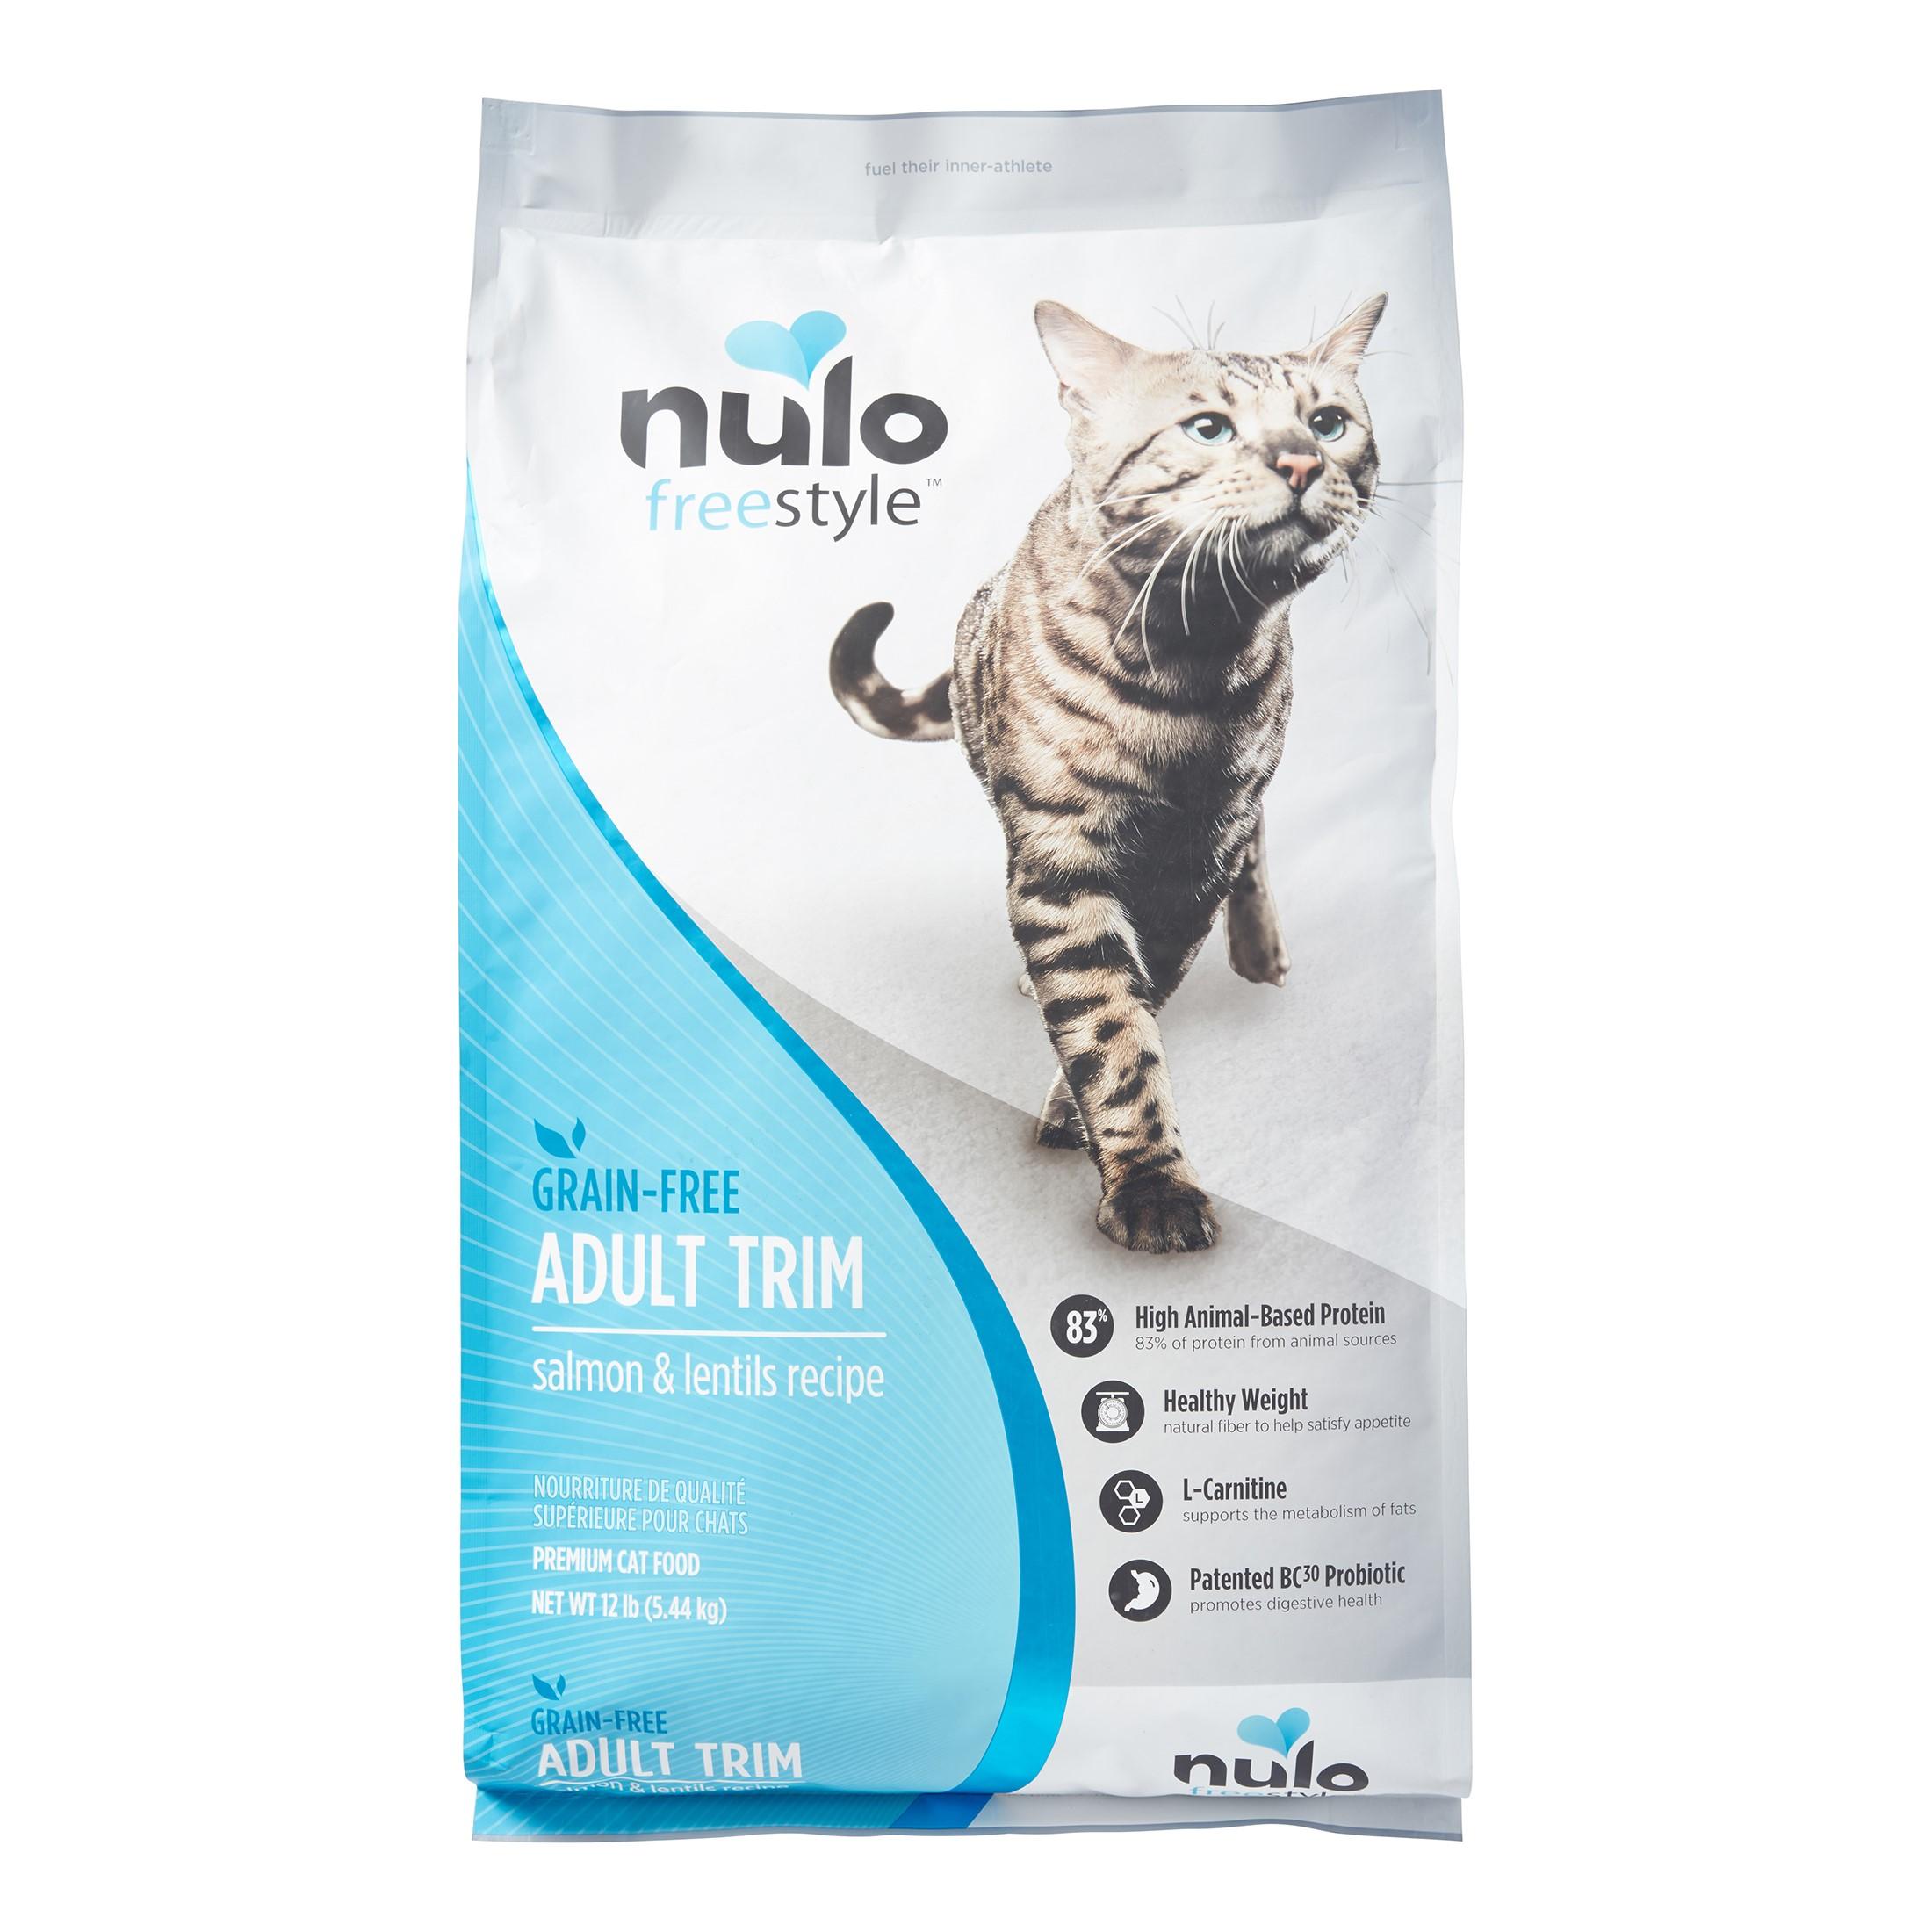 Nulo Freestyle Grain-Free Adult Trim Salmon & Lentils Dry Cat Food, 12 Lb